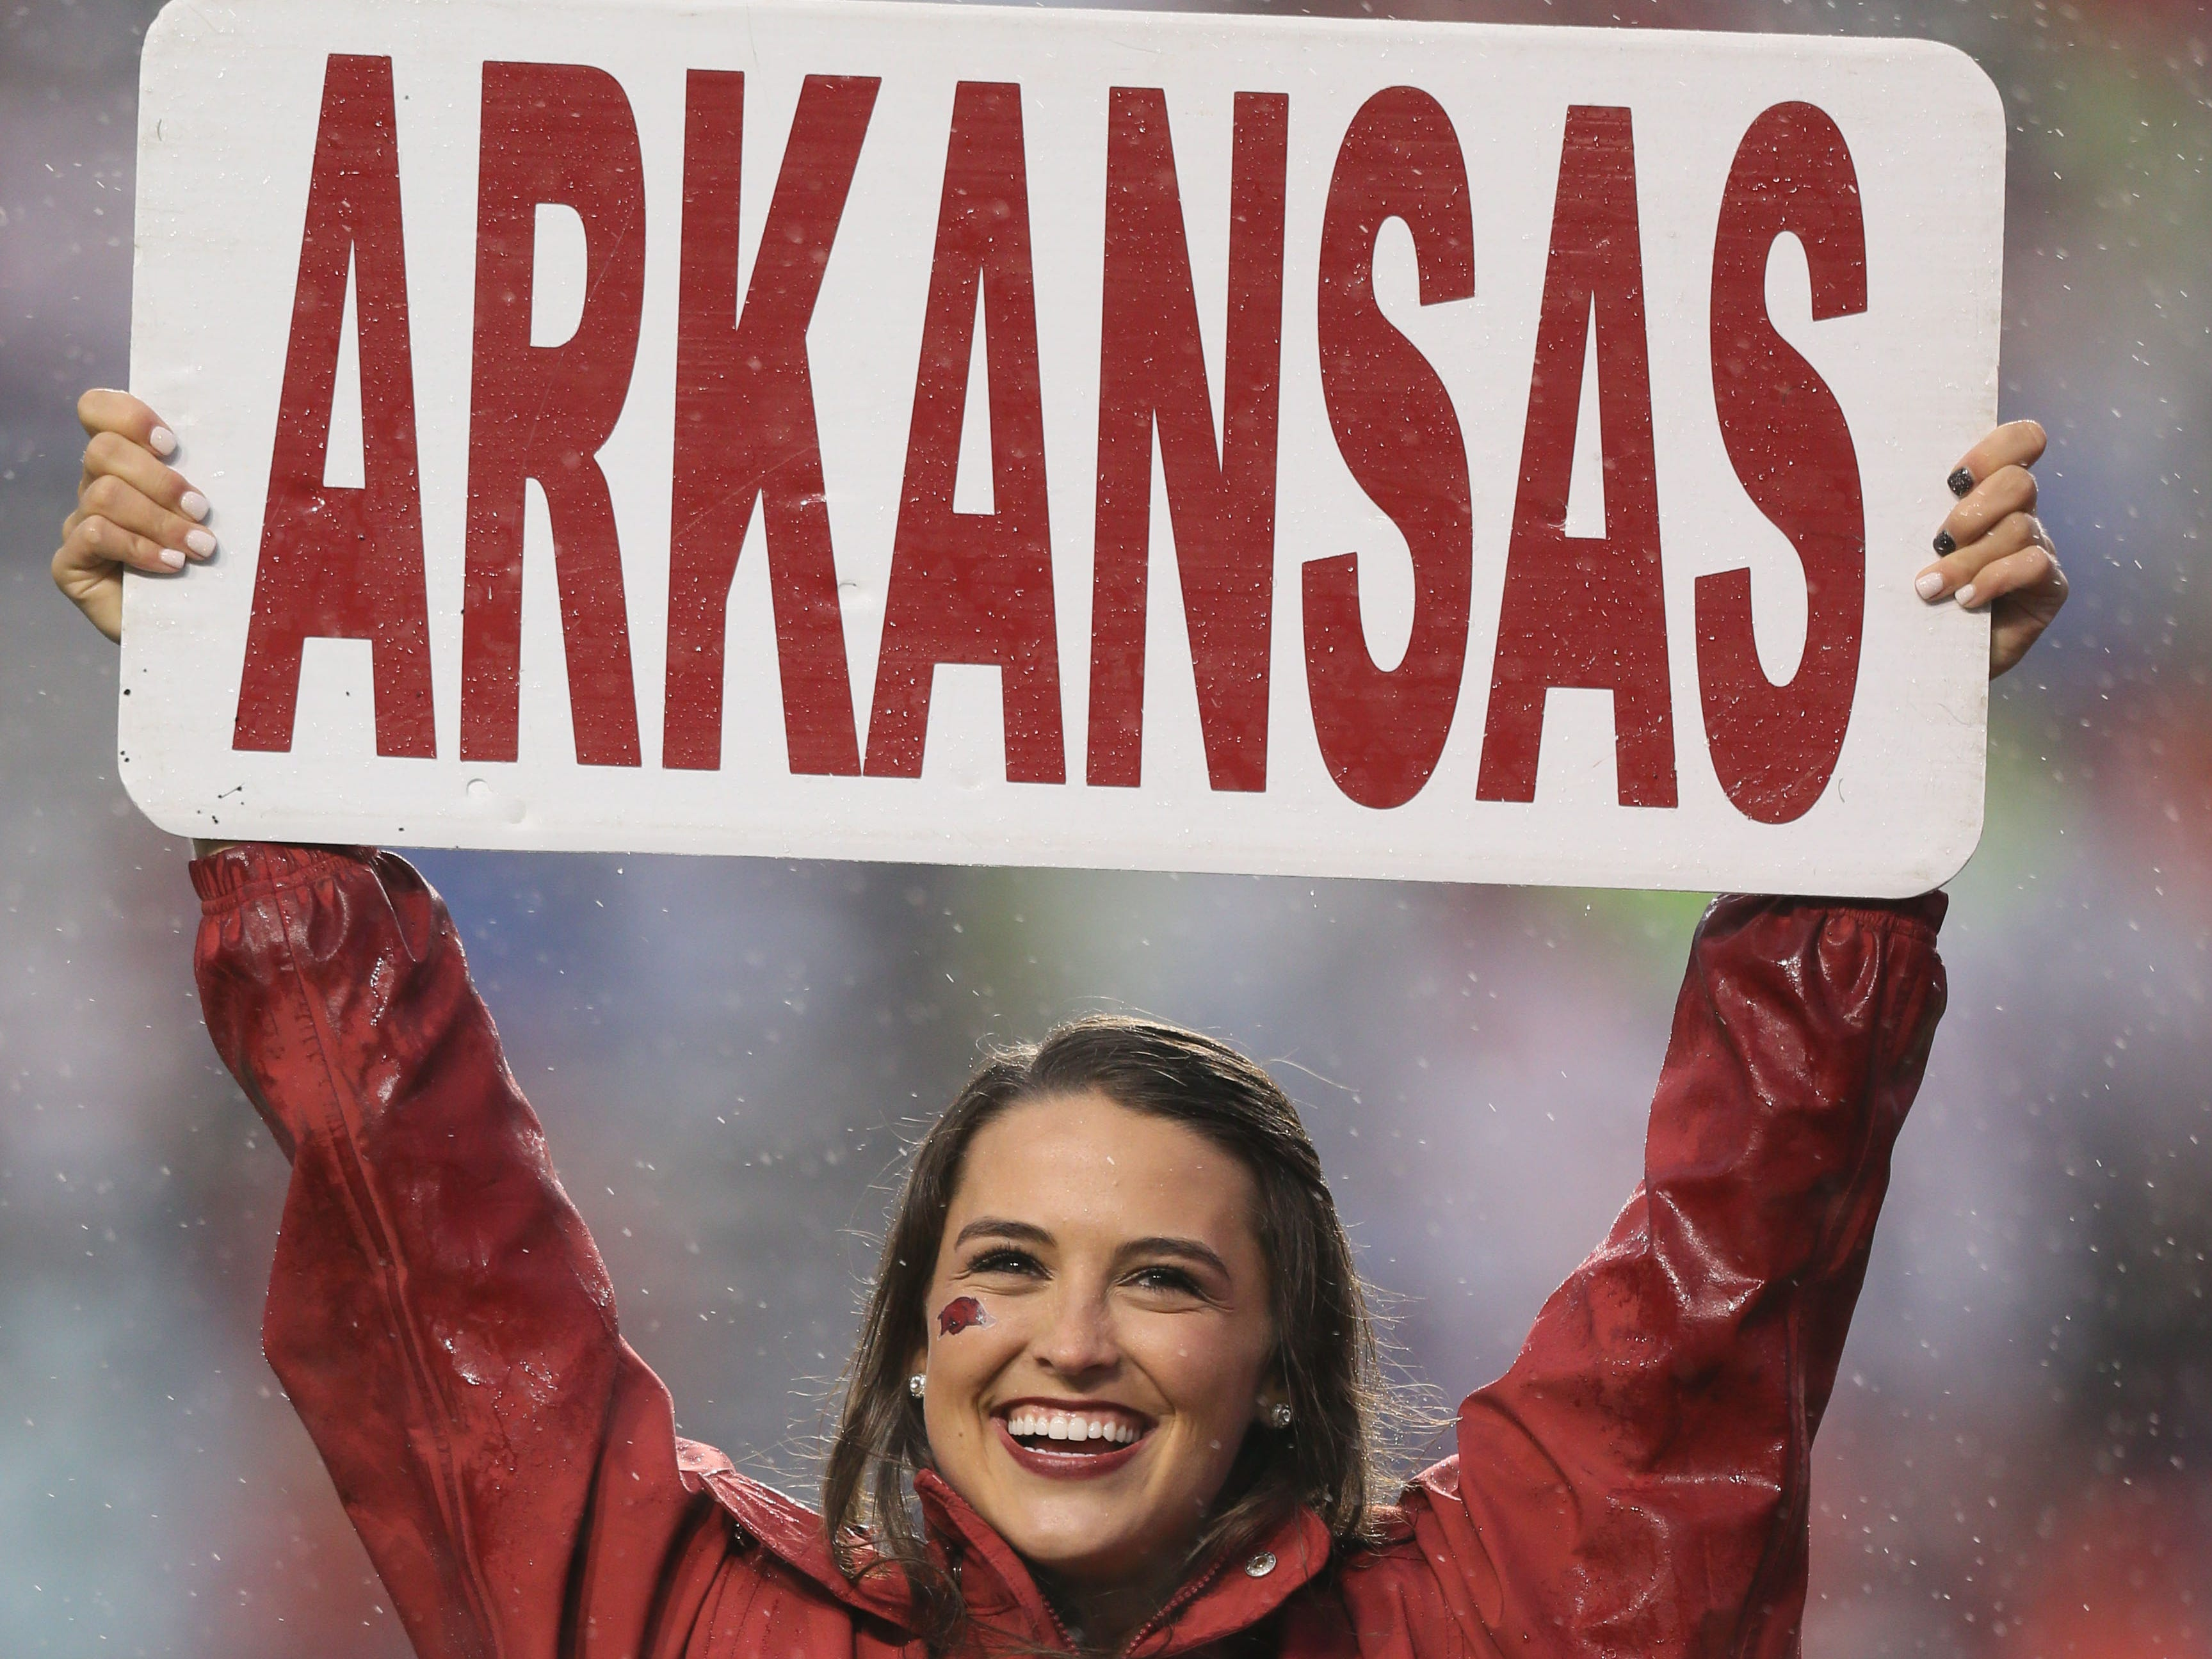 Week 7: An Arkansas Razorbacks cheerleader prior to the game against the Ole Miss Rebels at War Memorial Stadium.